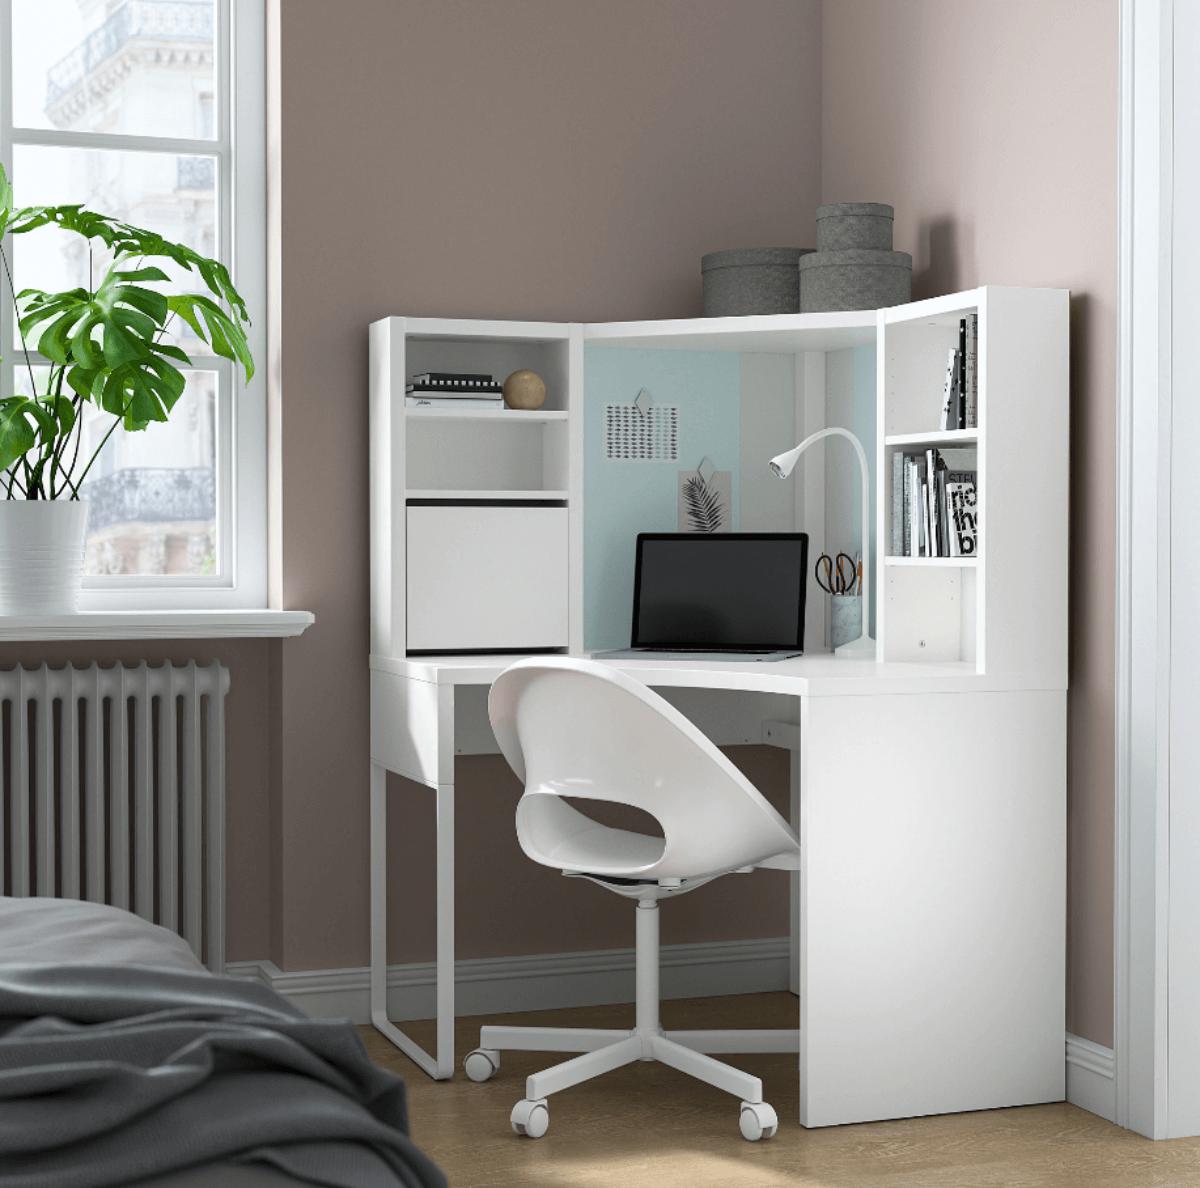 Huecos difíciles: mueble esquinero